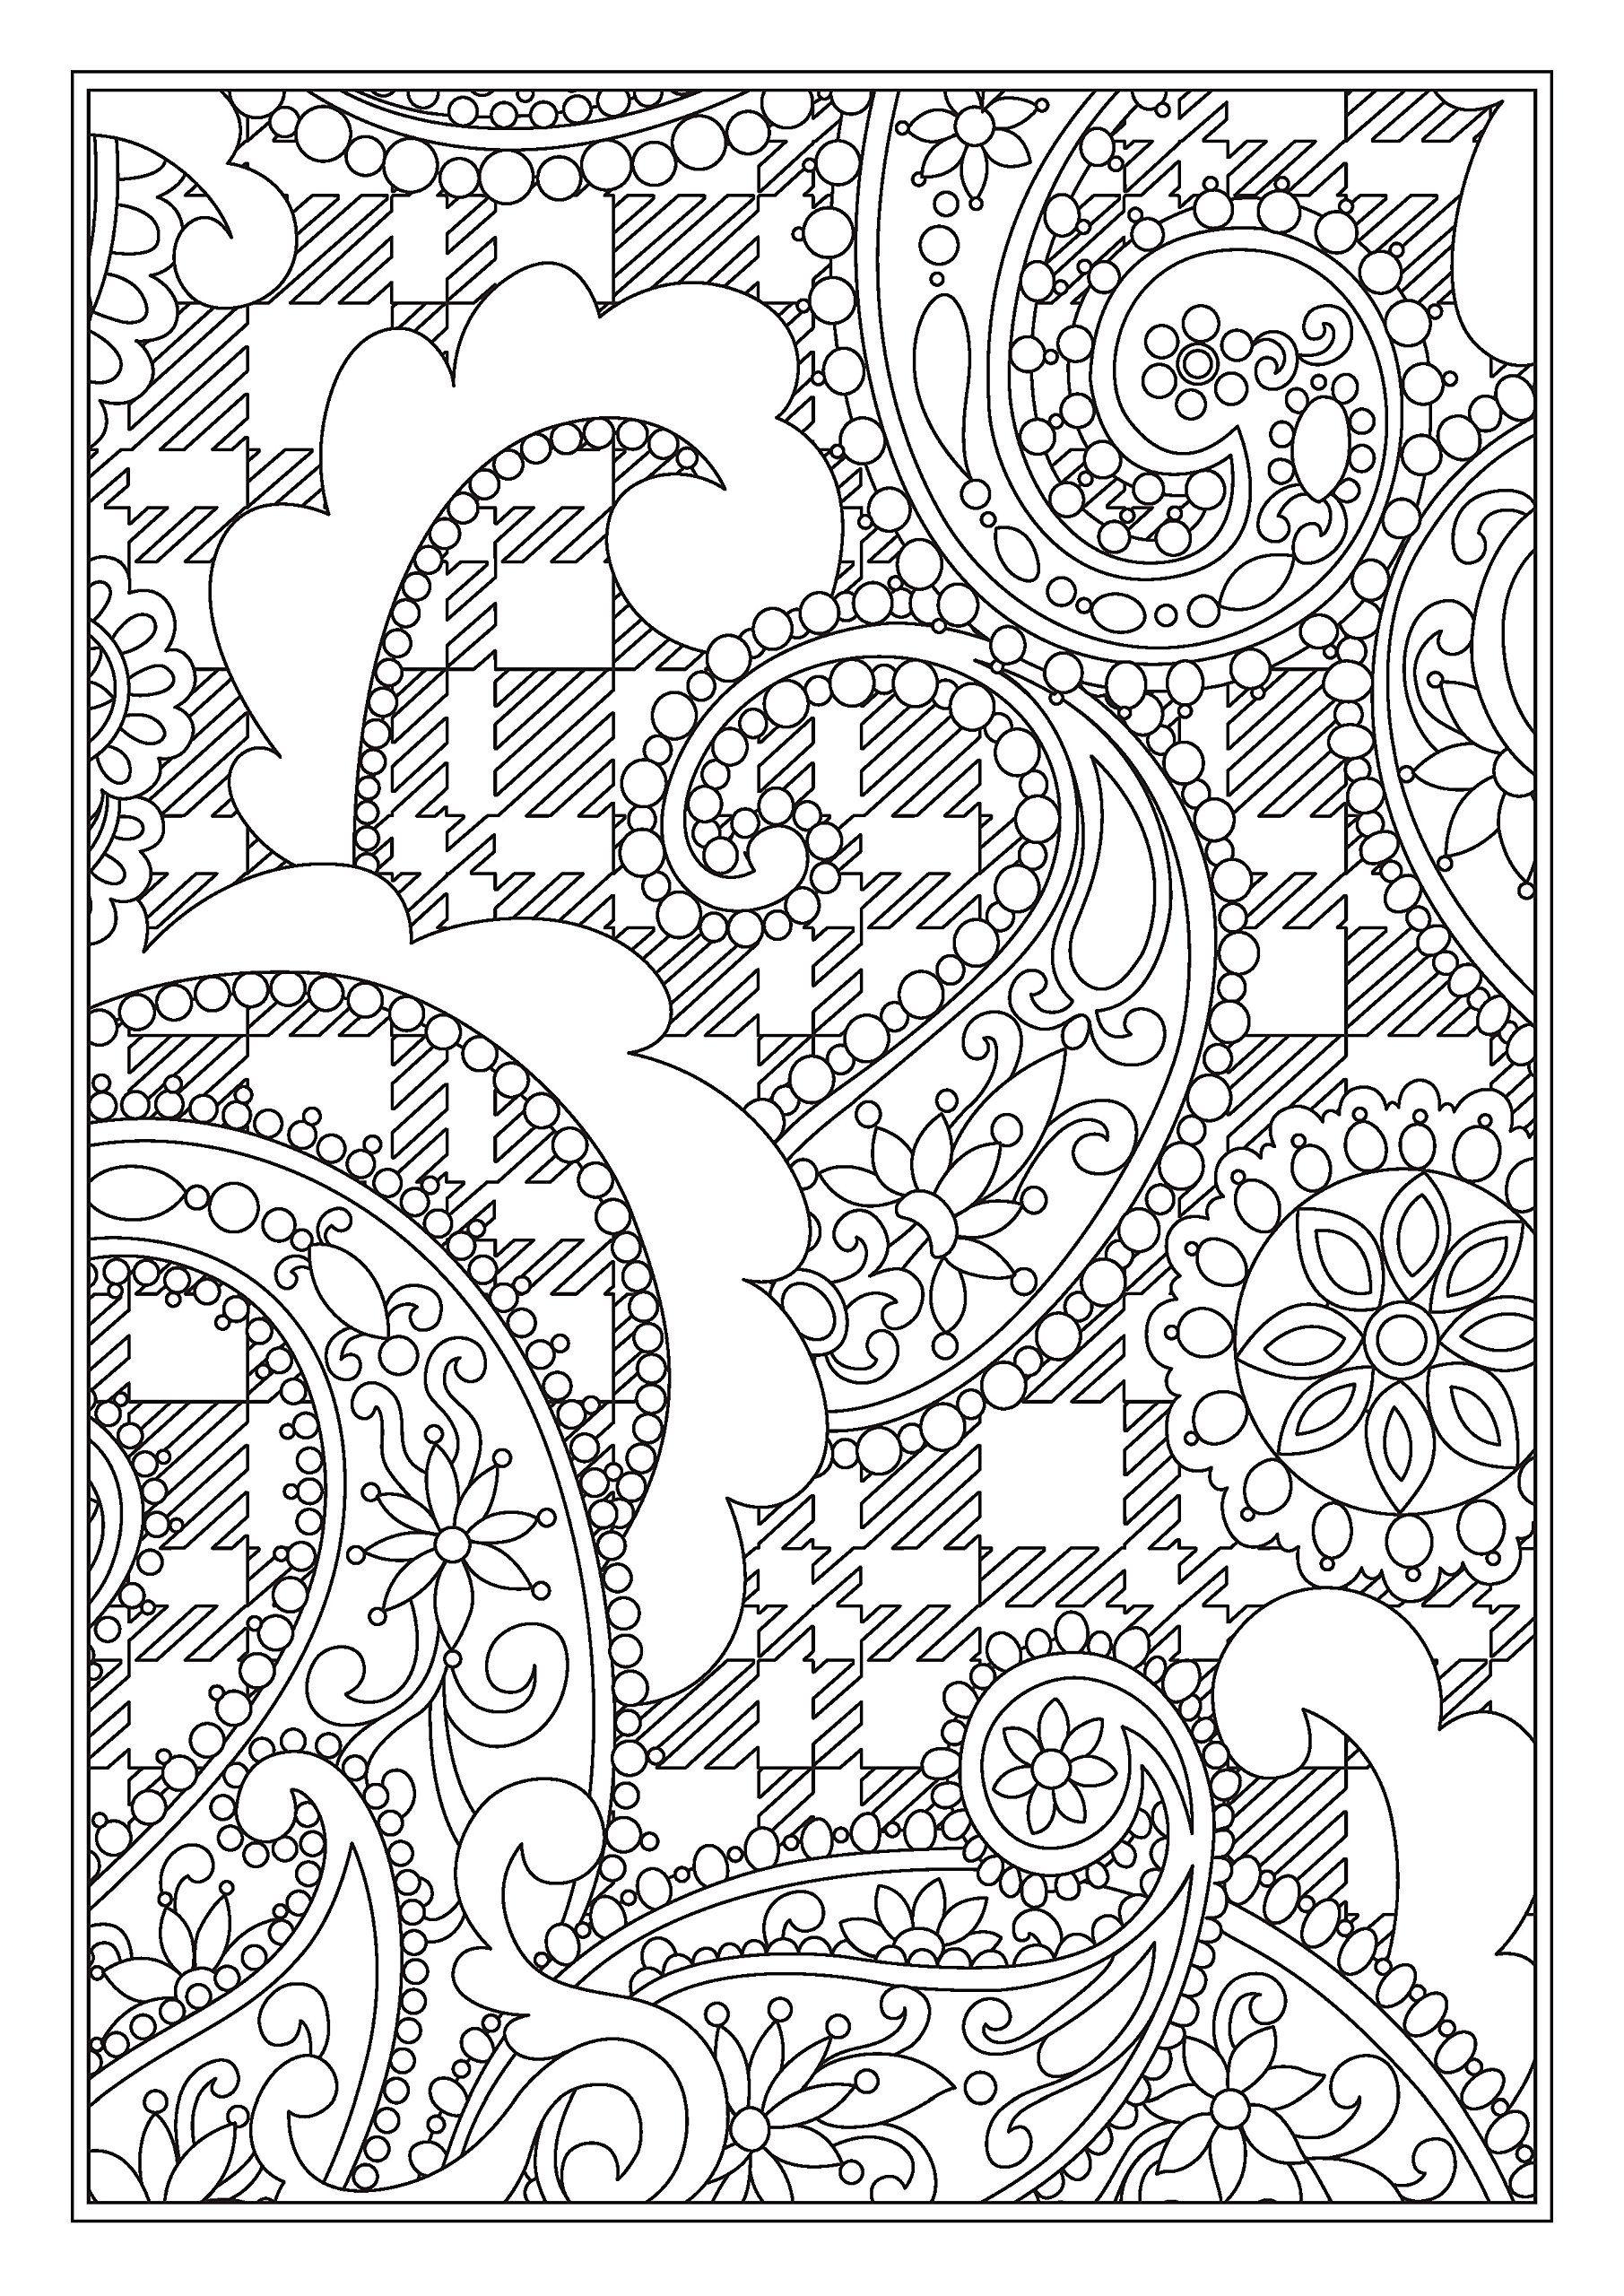 Amazon Com Vera Bradley Coloring Collection Design Originals 4 Book Set With Slipcase Includes Beautifu Designs Coloring Books Coloring Books Coloring Pages